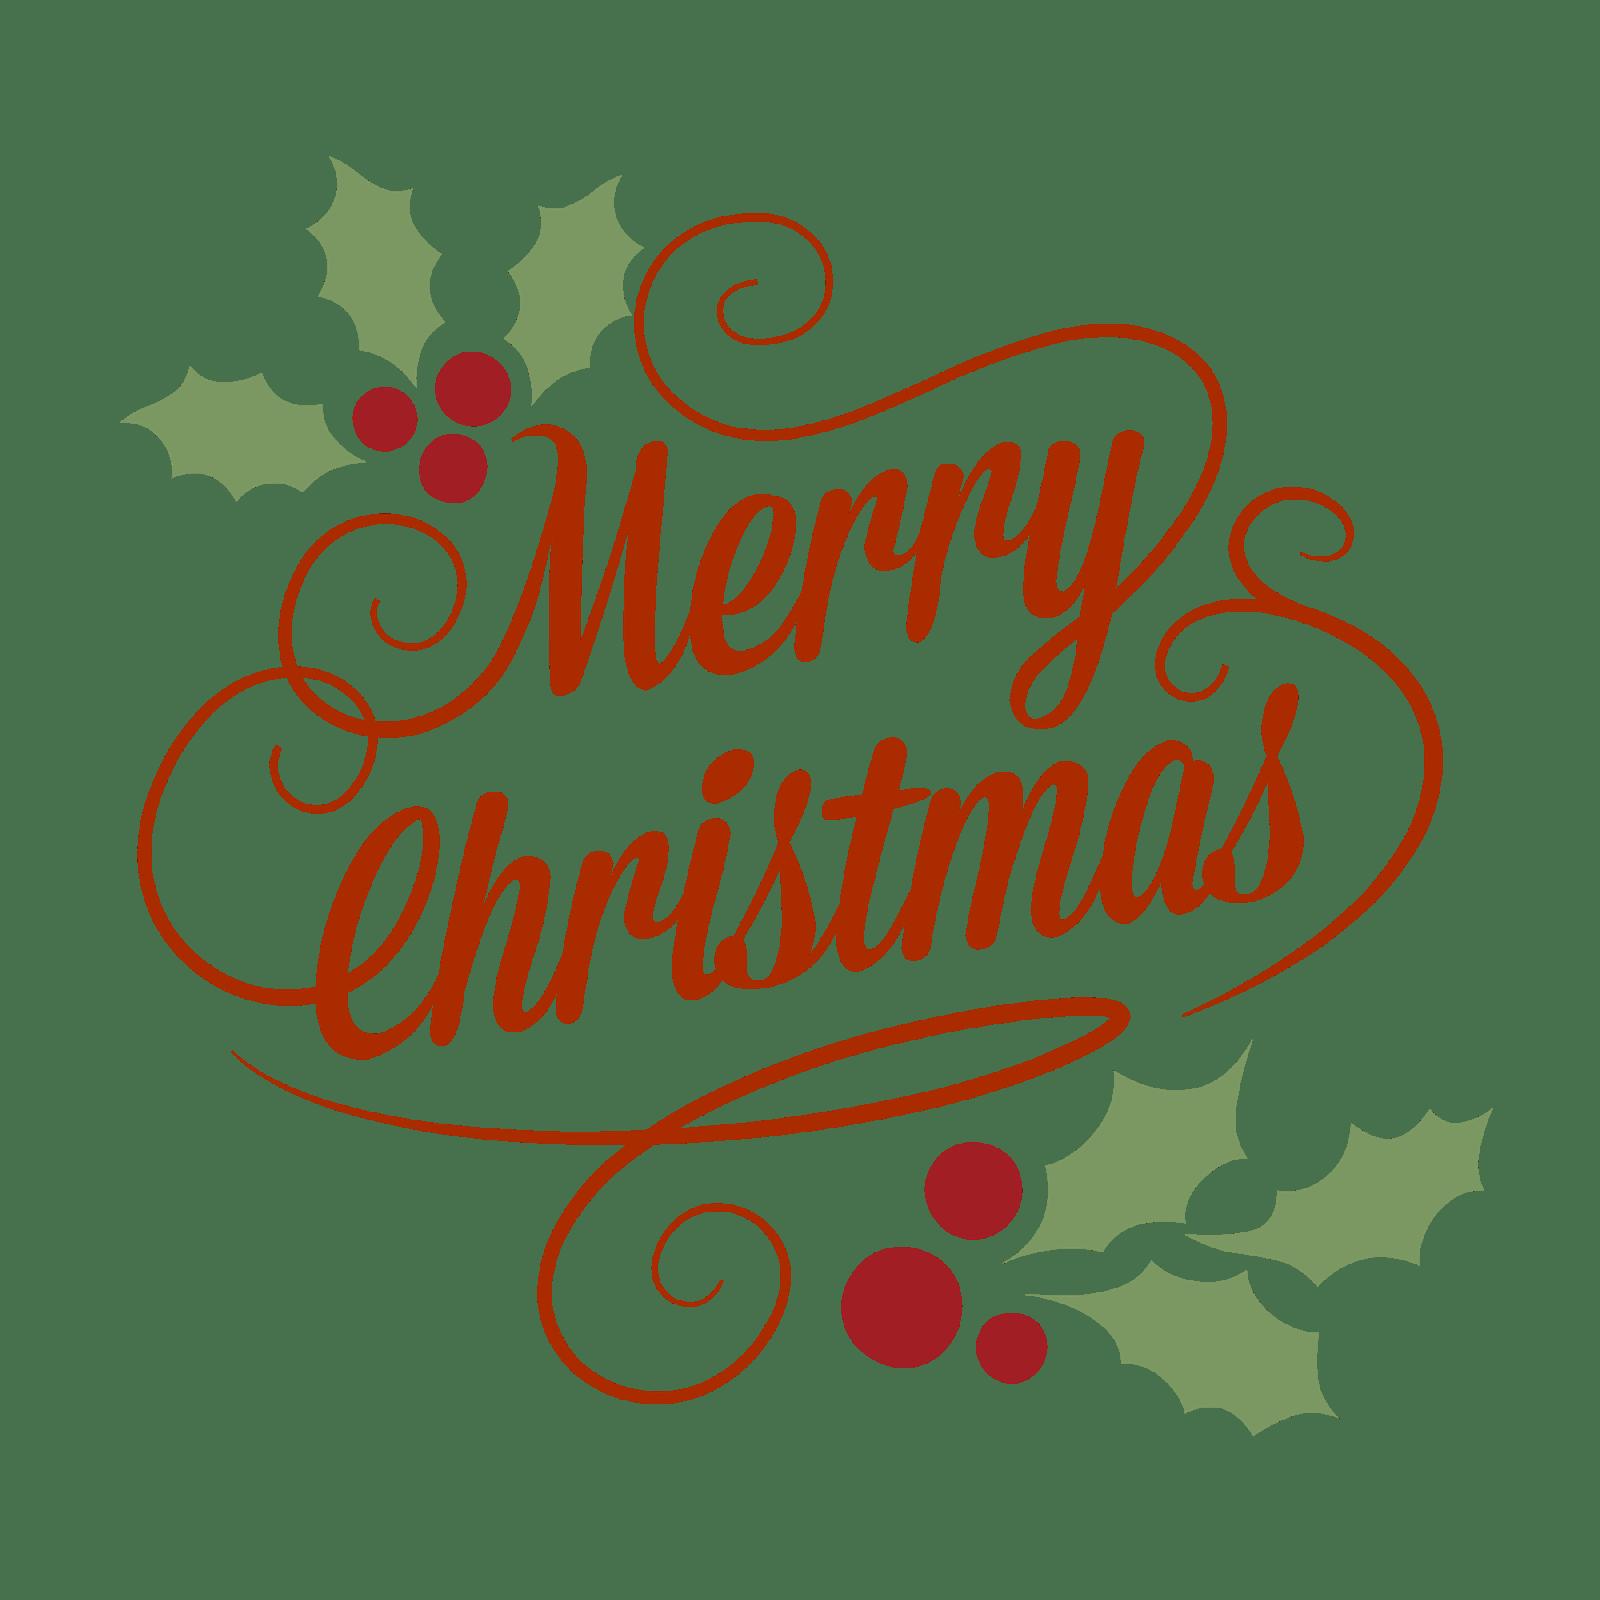 Merry christmas clipart transparent clip transparent Merry Christmas Classical Vintage Sign transparent PNG - StickPNG clip transparent